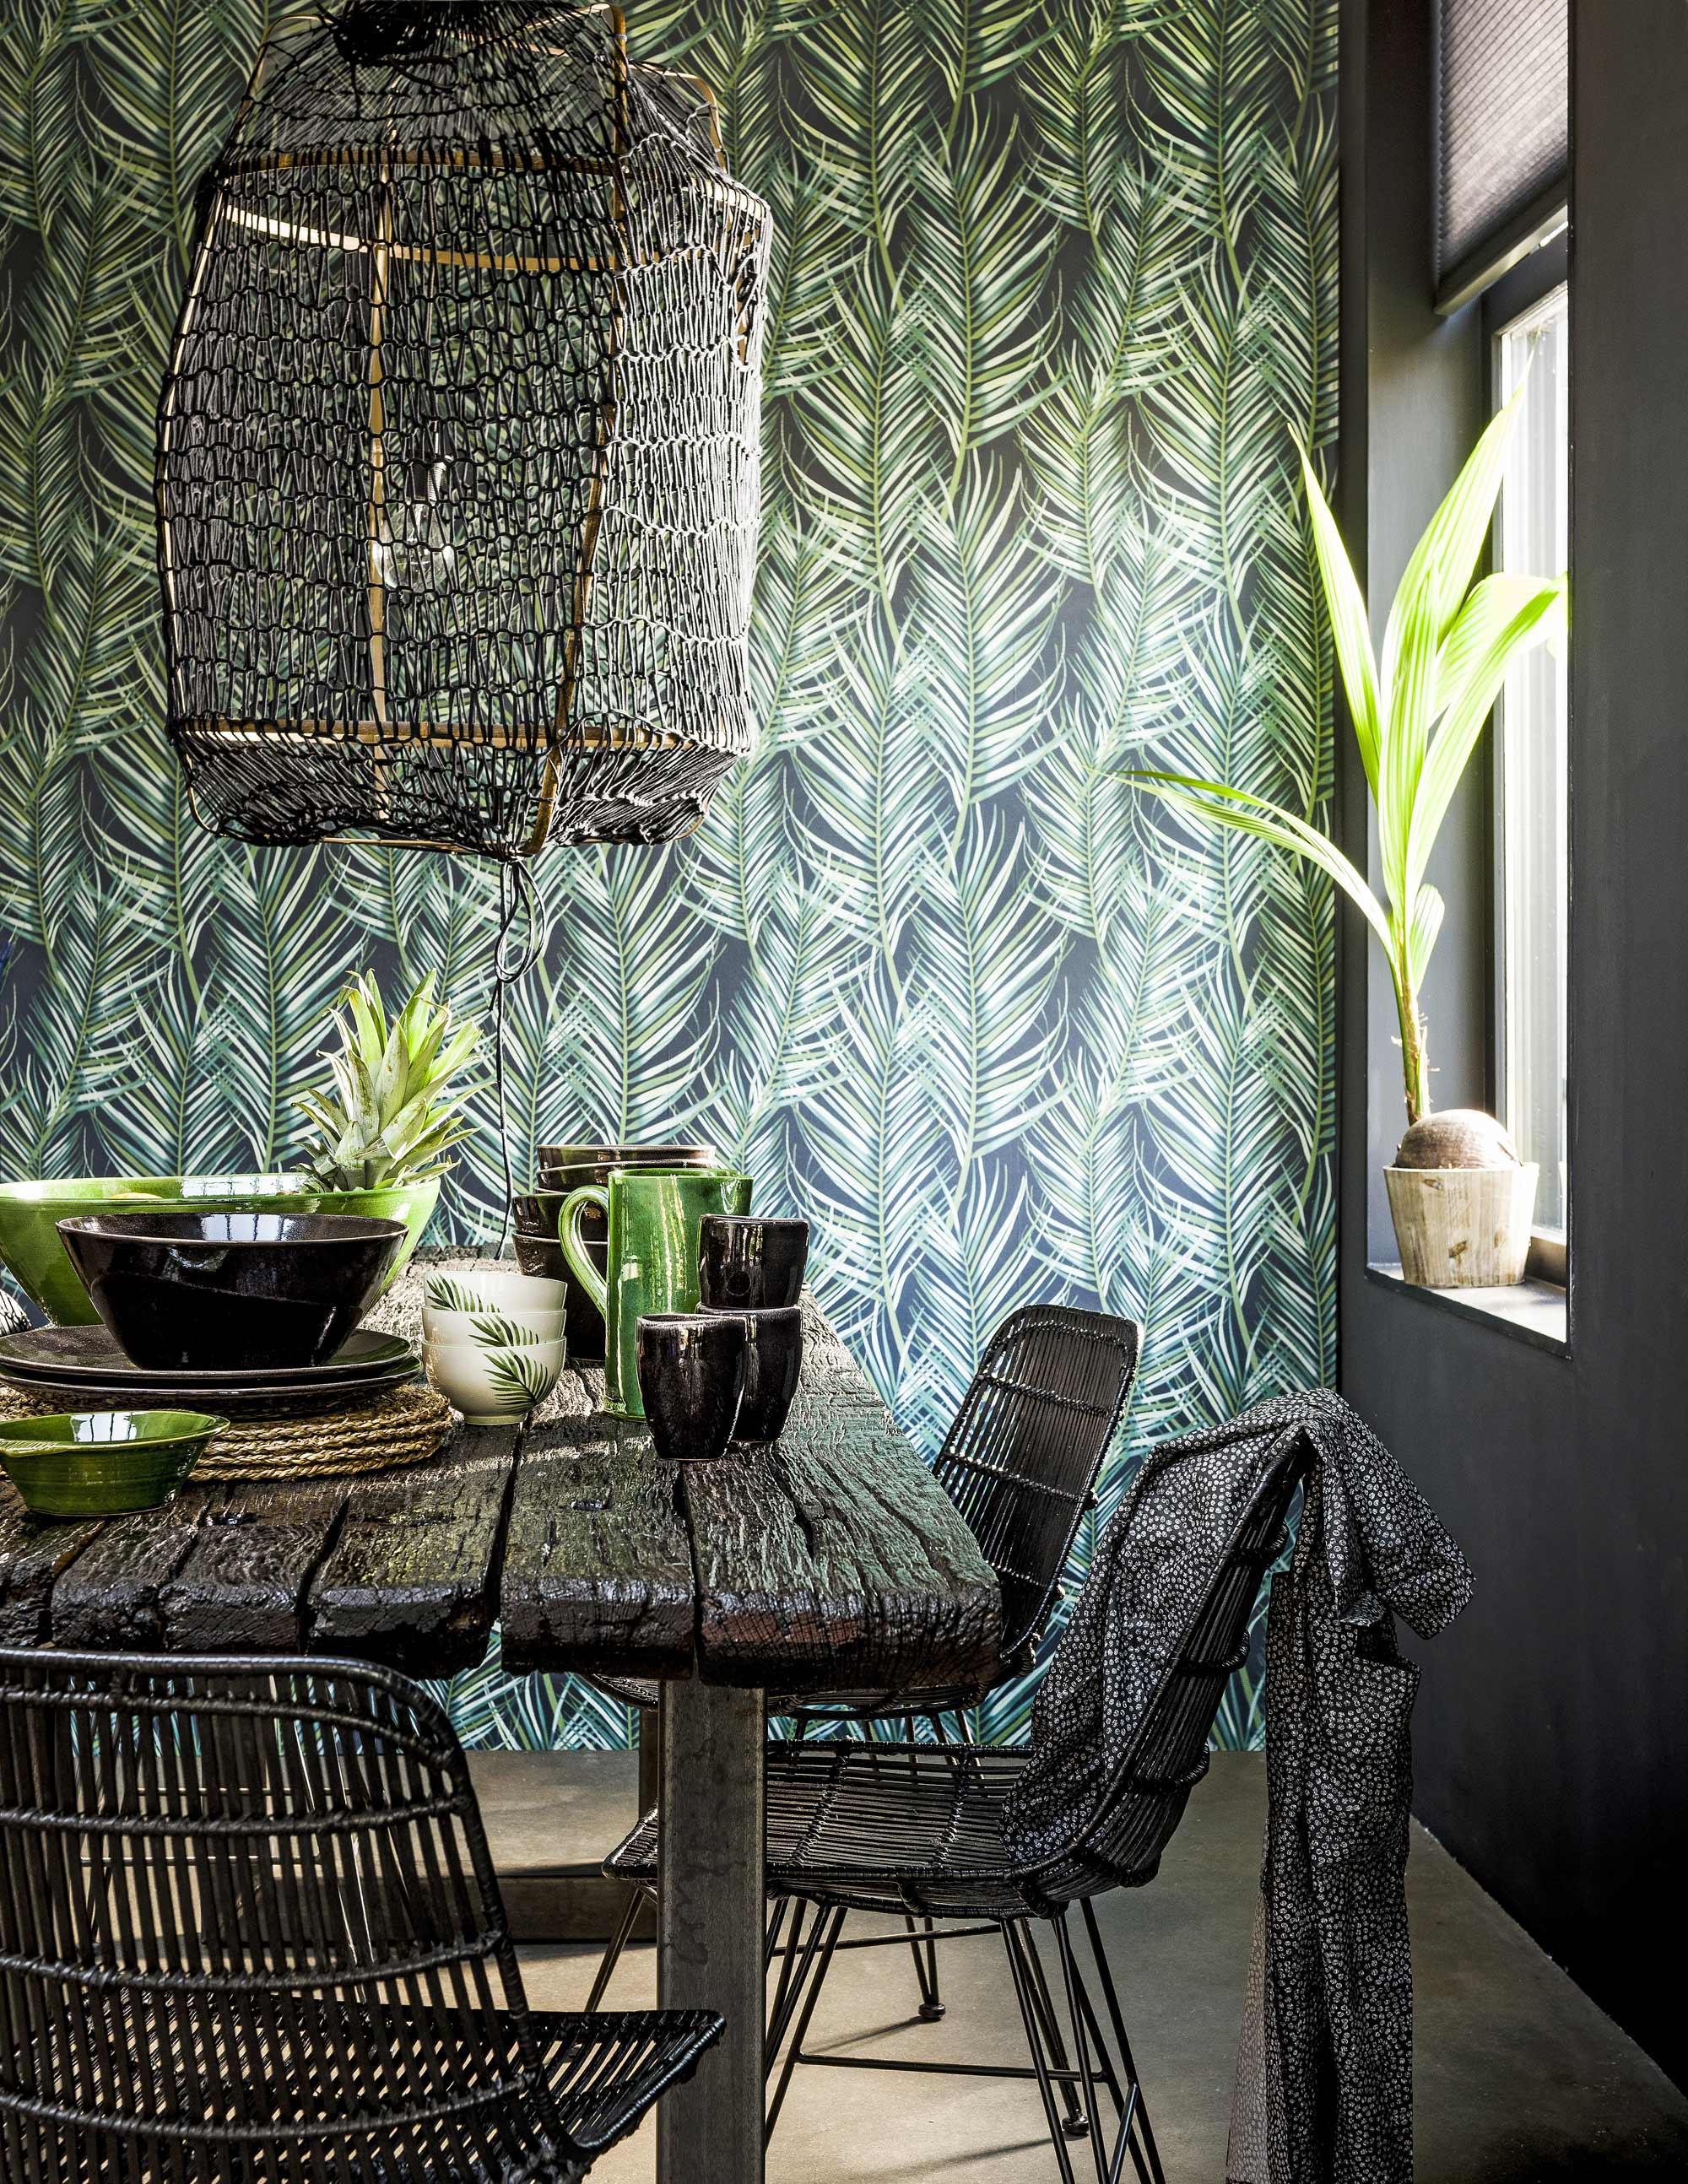 Papier Jungle Vert et Noir